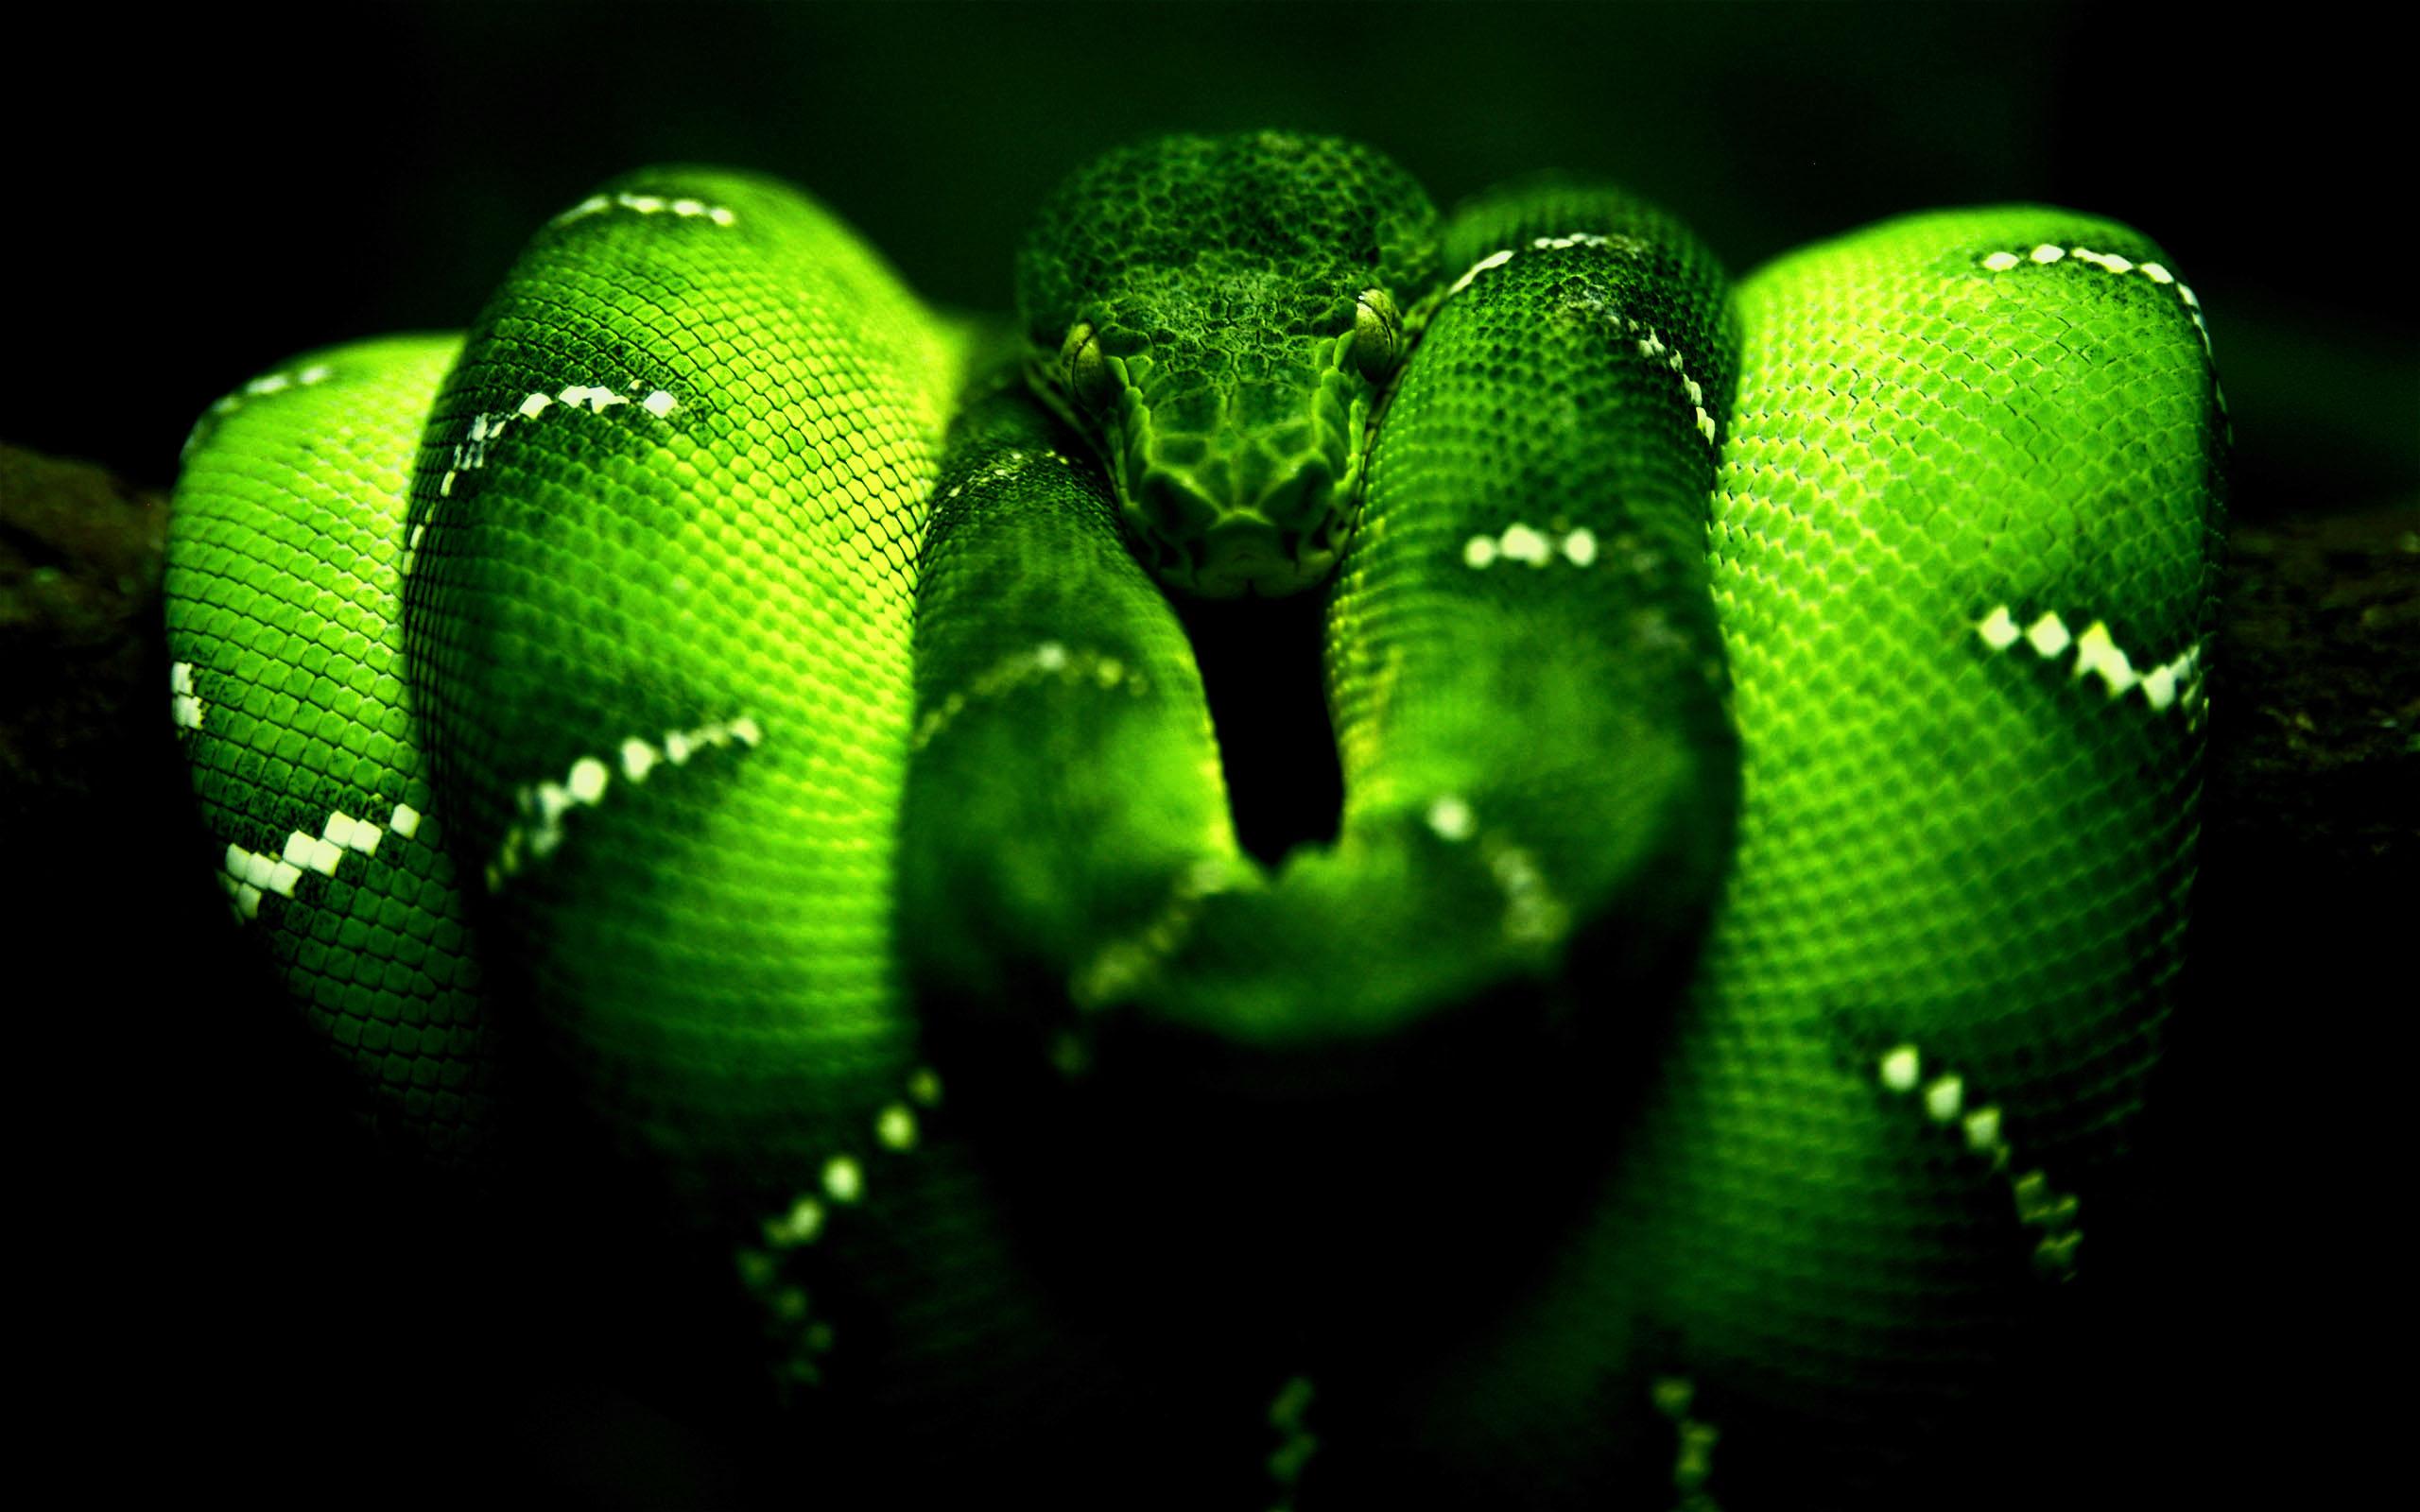 Neon Snake Wallpaper 2560x1600